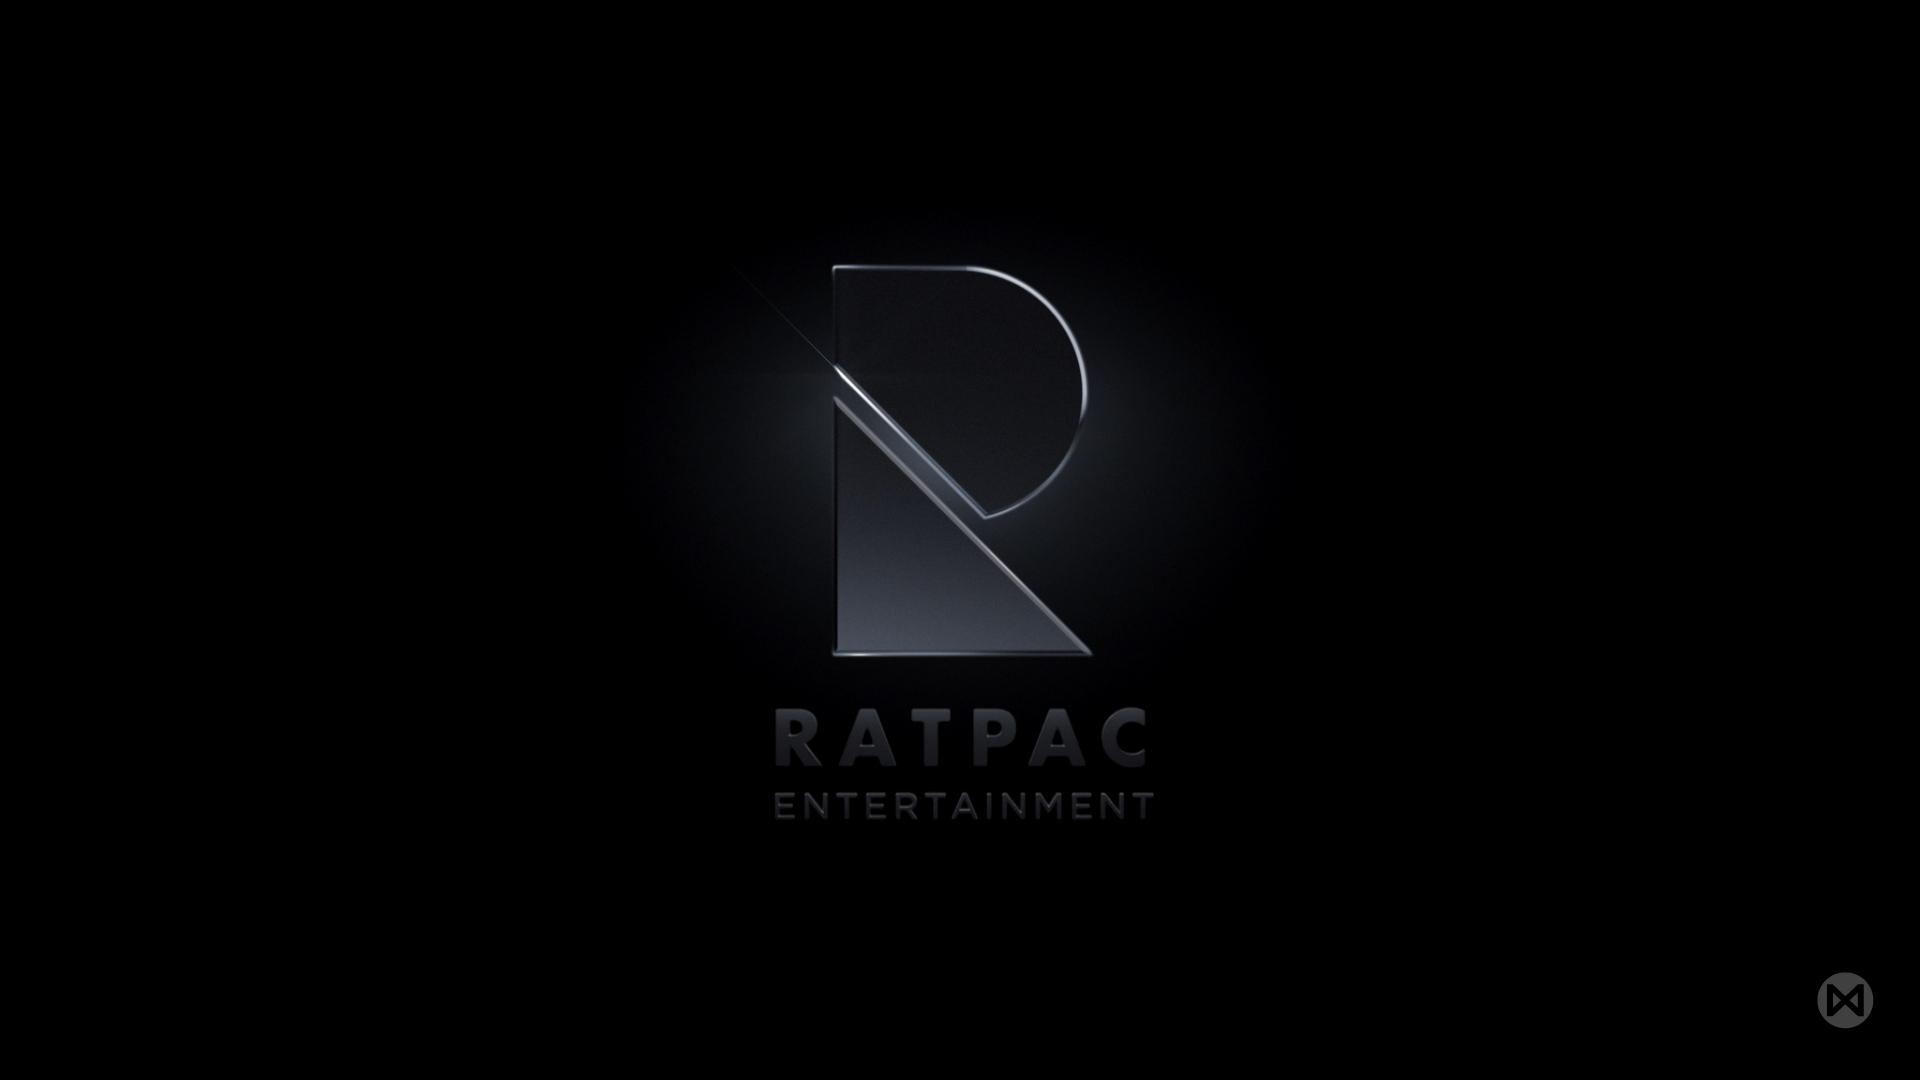 DarkMatter_Ratpac_Logo-15.jpg